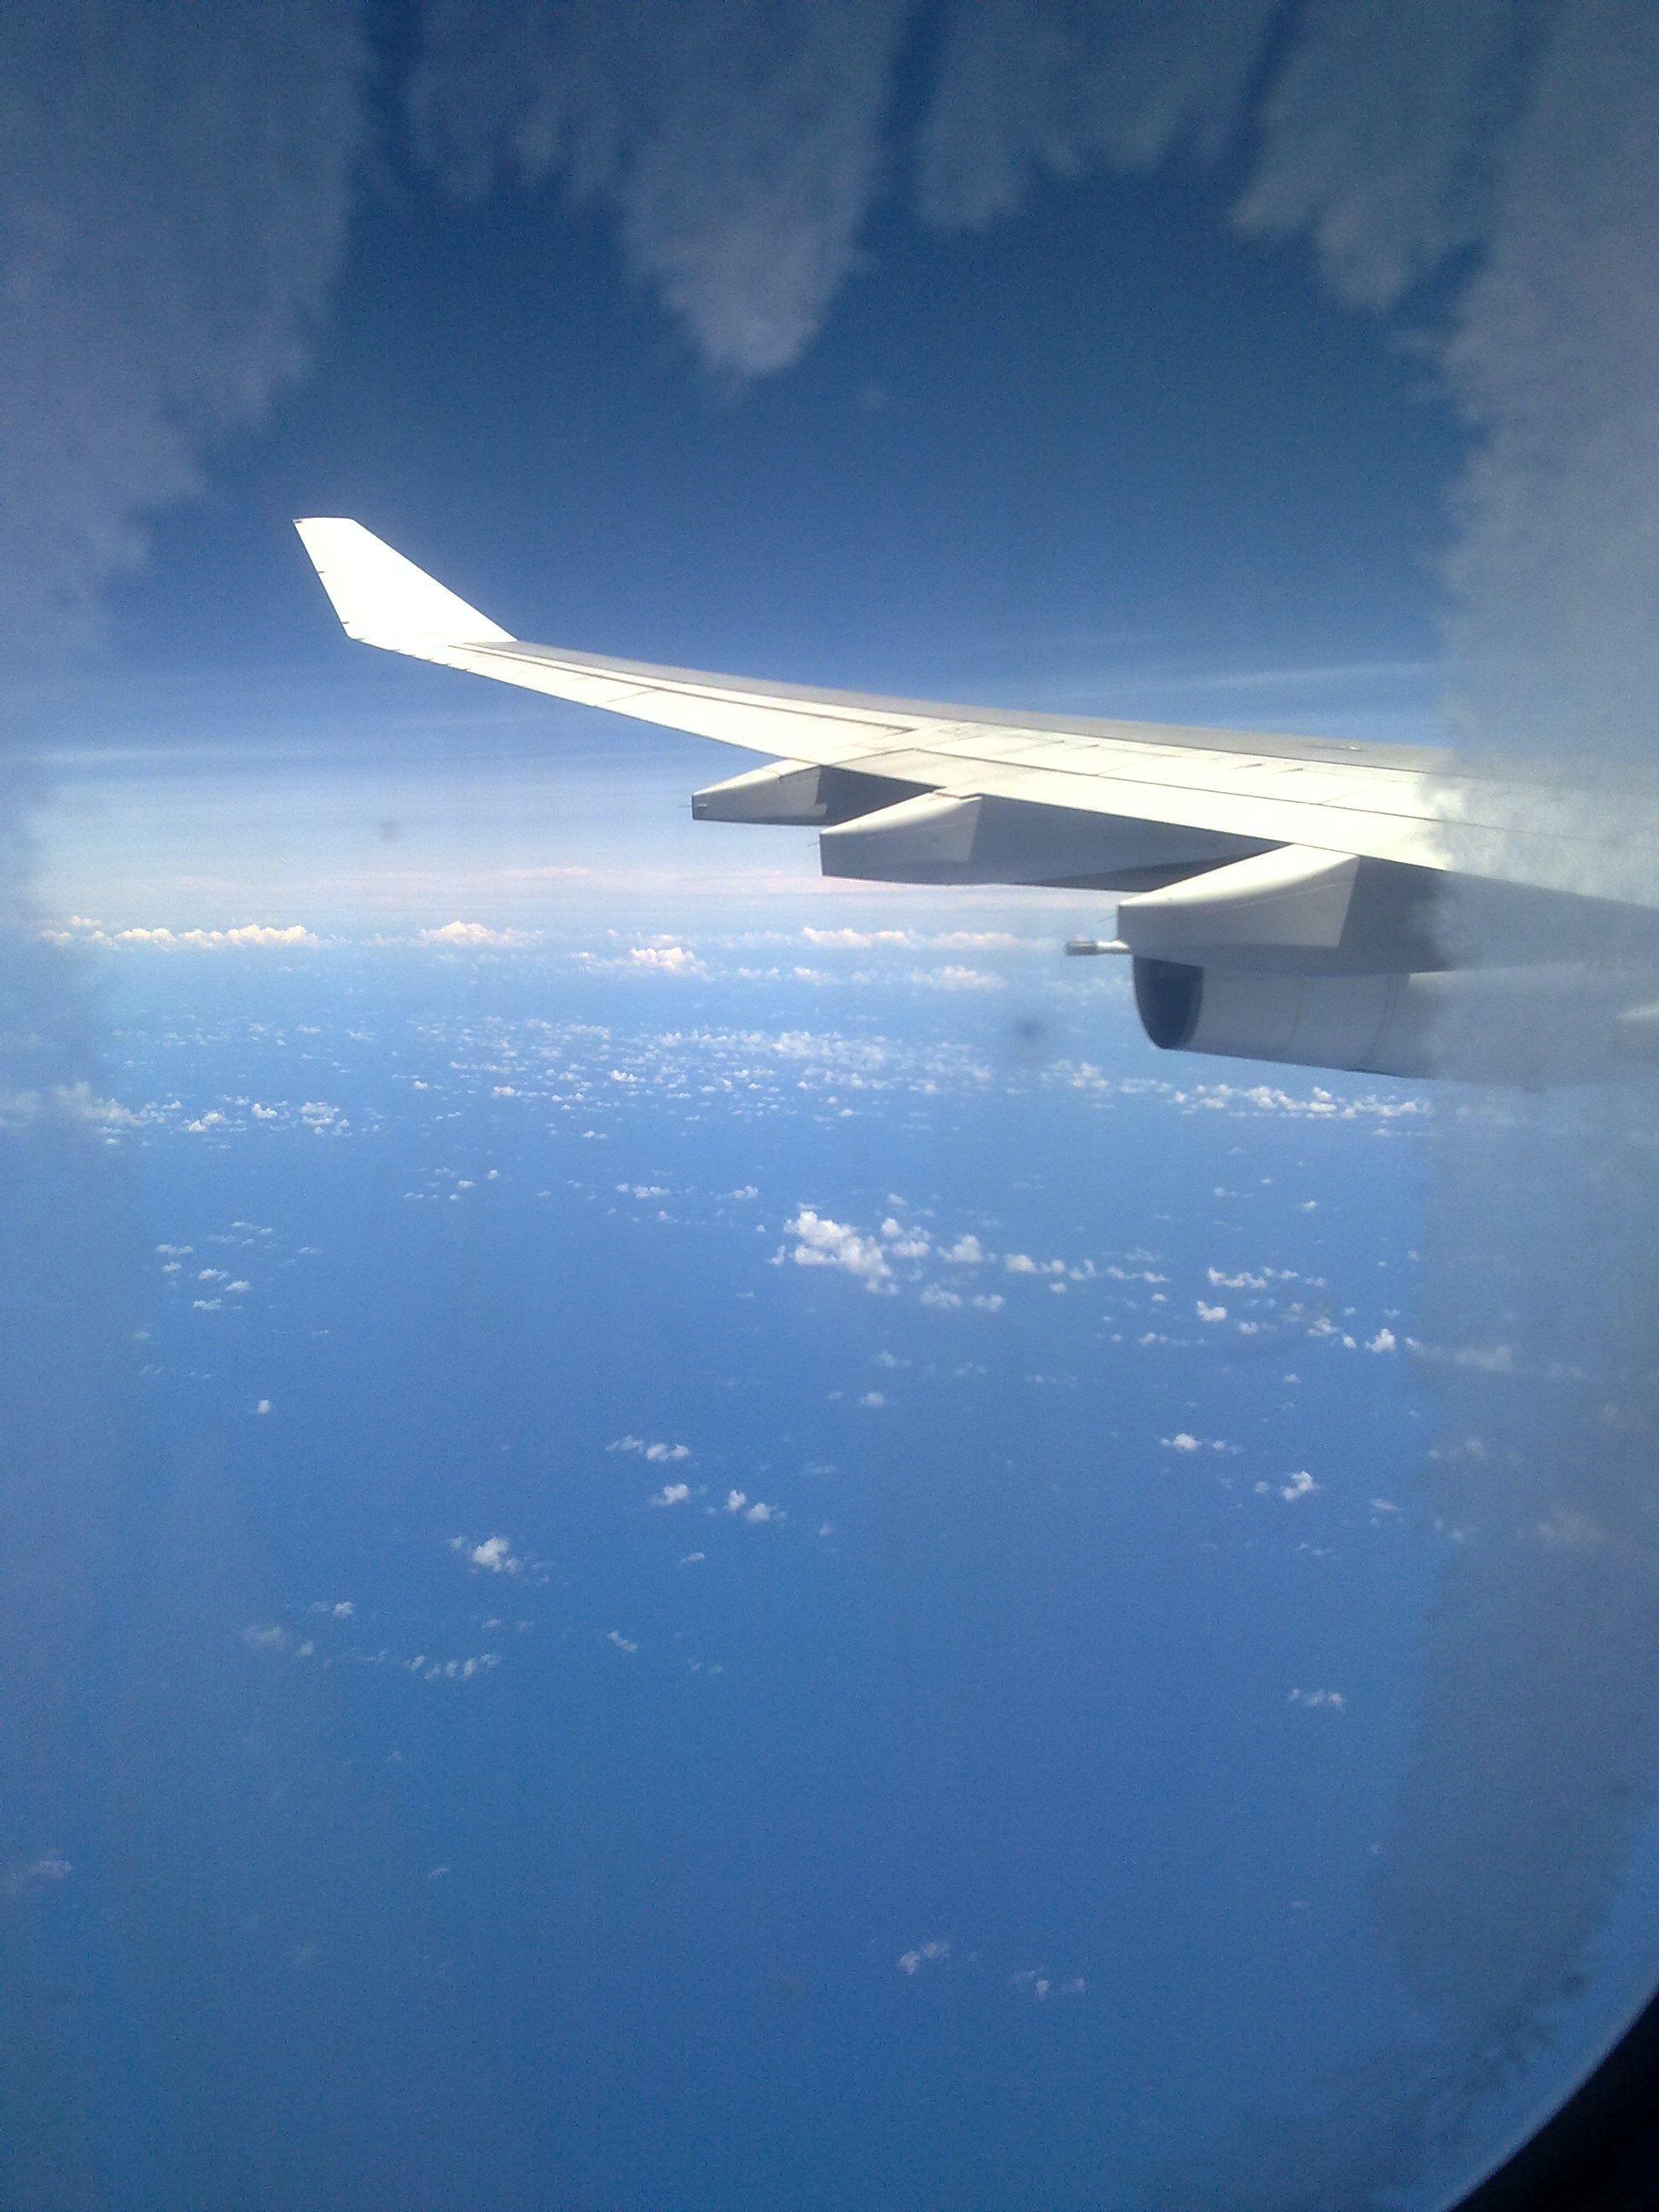 Voyage vers le Costa Rica - billet d'avion